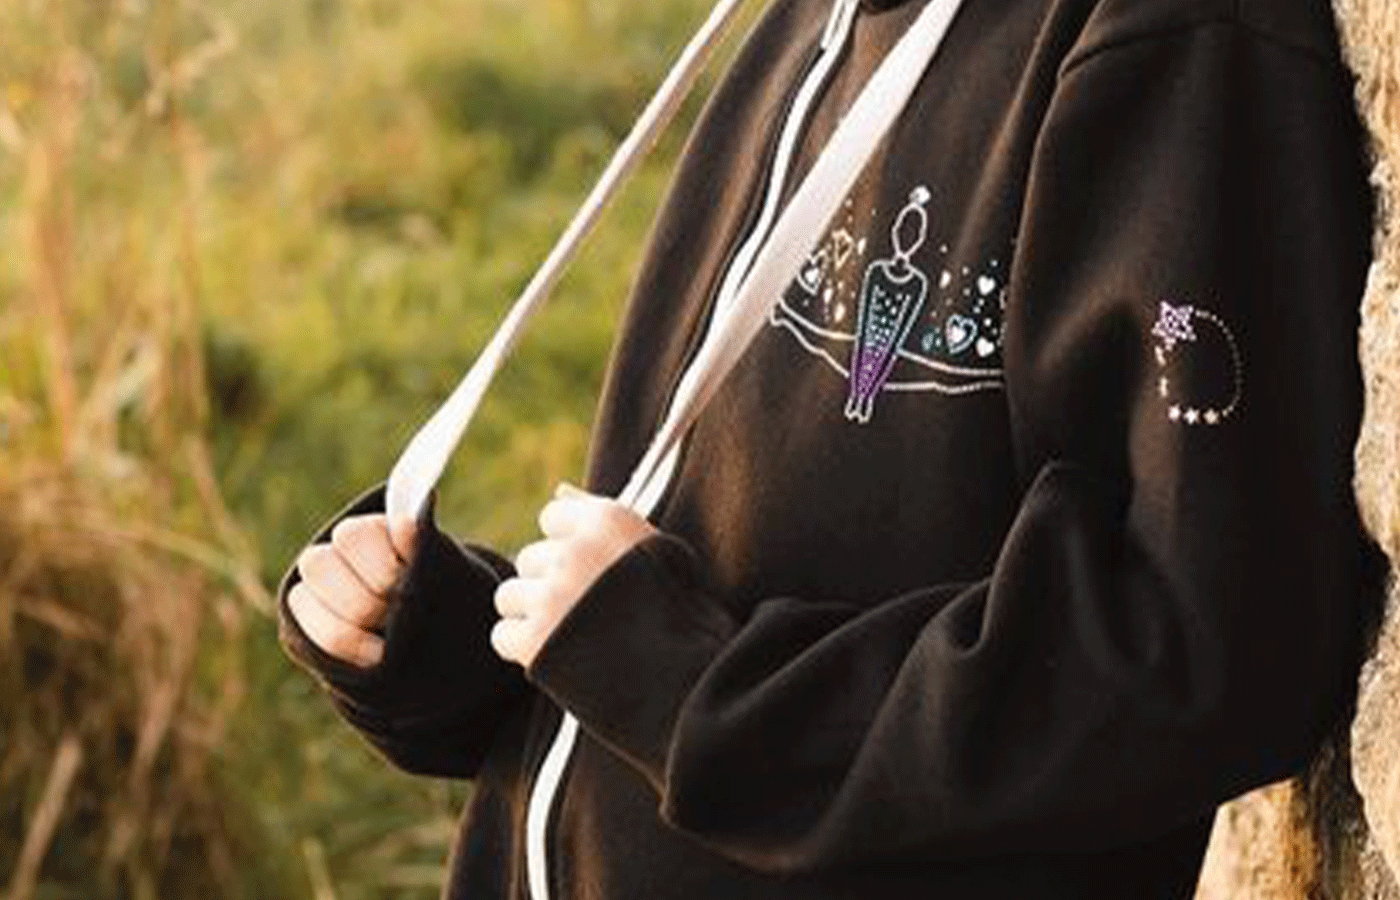 Personalised products, onesies, customised, custom, hoodies, shorts